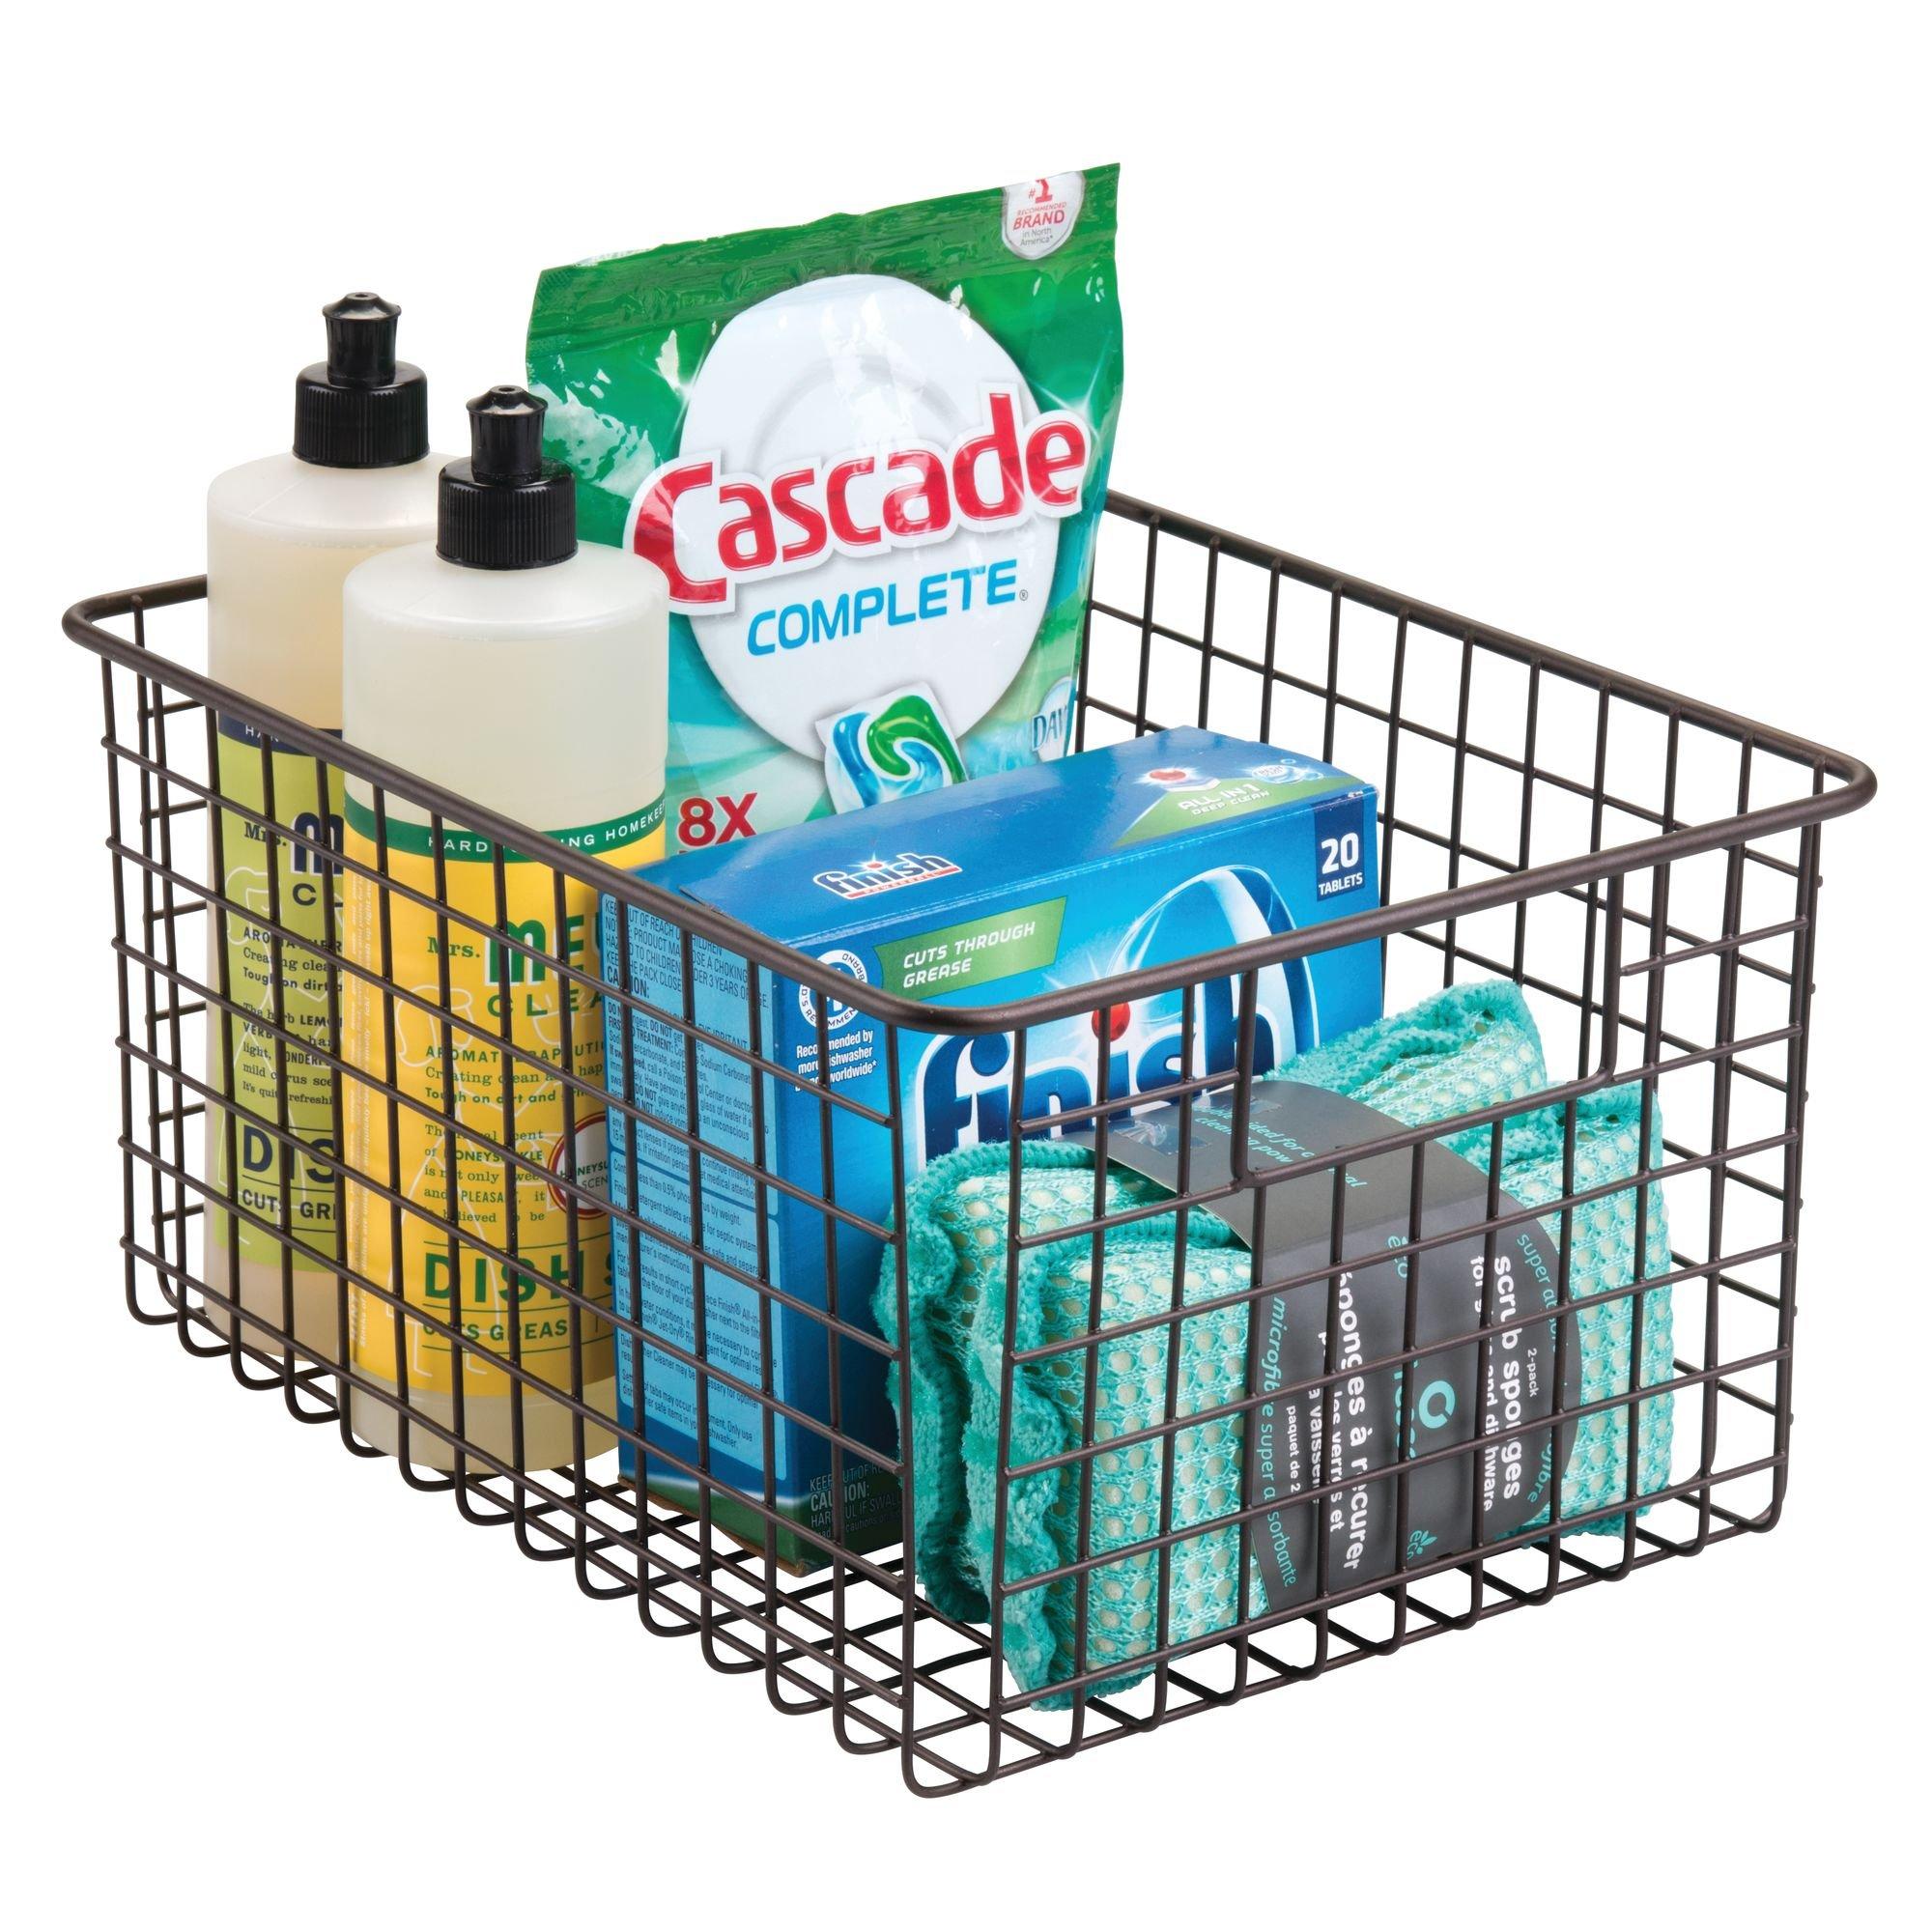 mDesign Kitchen Pantry Bathroom Office Garage Freezer Food Shelf Storage Organizer Heavy Duty Metal Wire Mesh Bins Baskets with Handles, 12'' x 9'' x 6'' - Set of 2, Bronze by mDesign (Image #3)